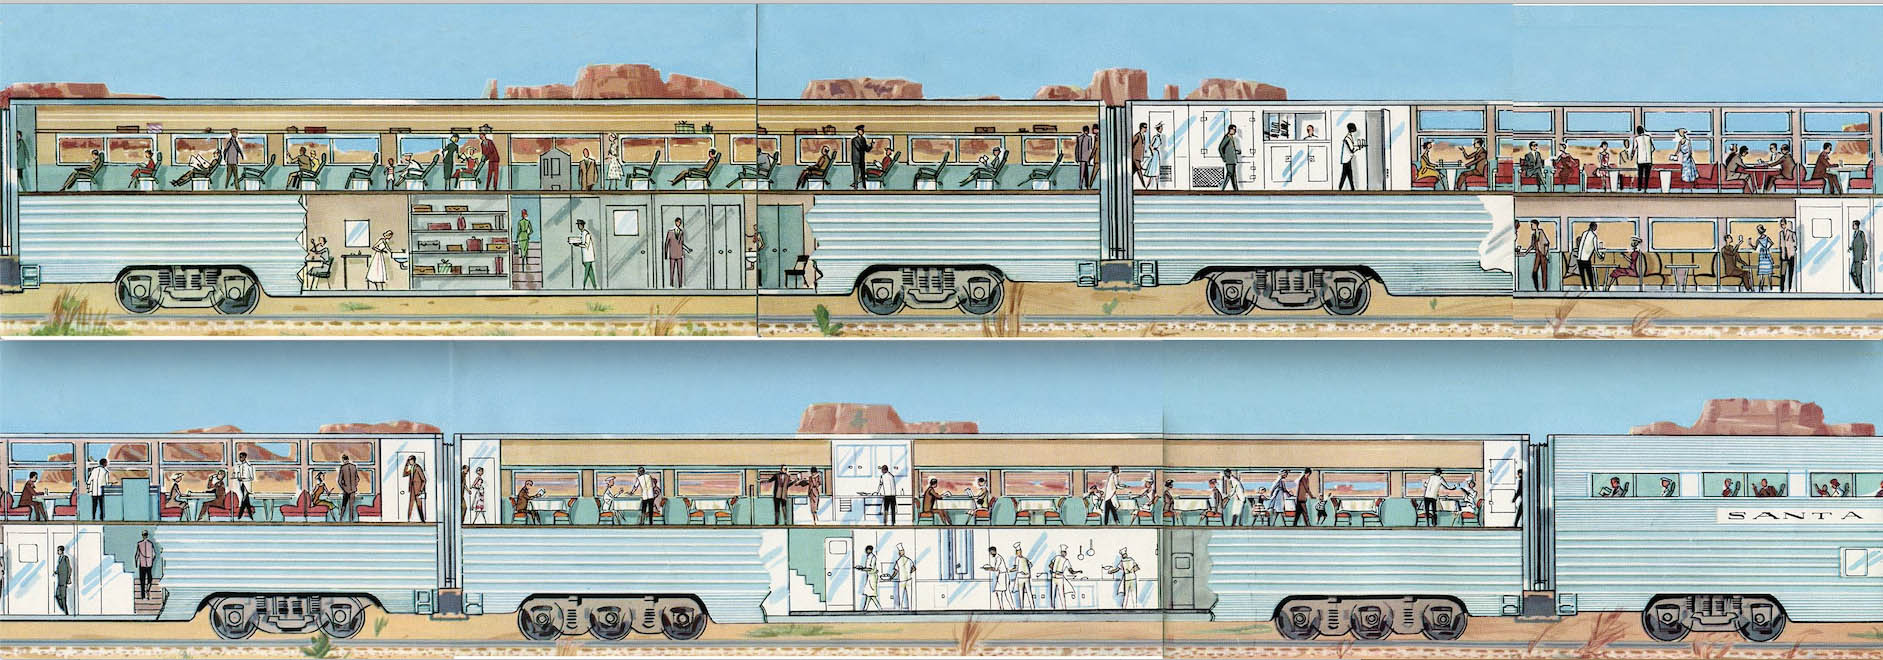 Artwork from brochure showing interiors of Santa Fe El Capitan passenger train